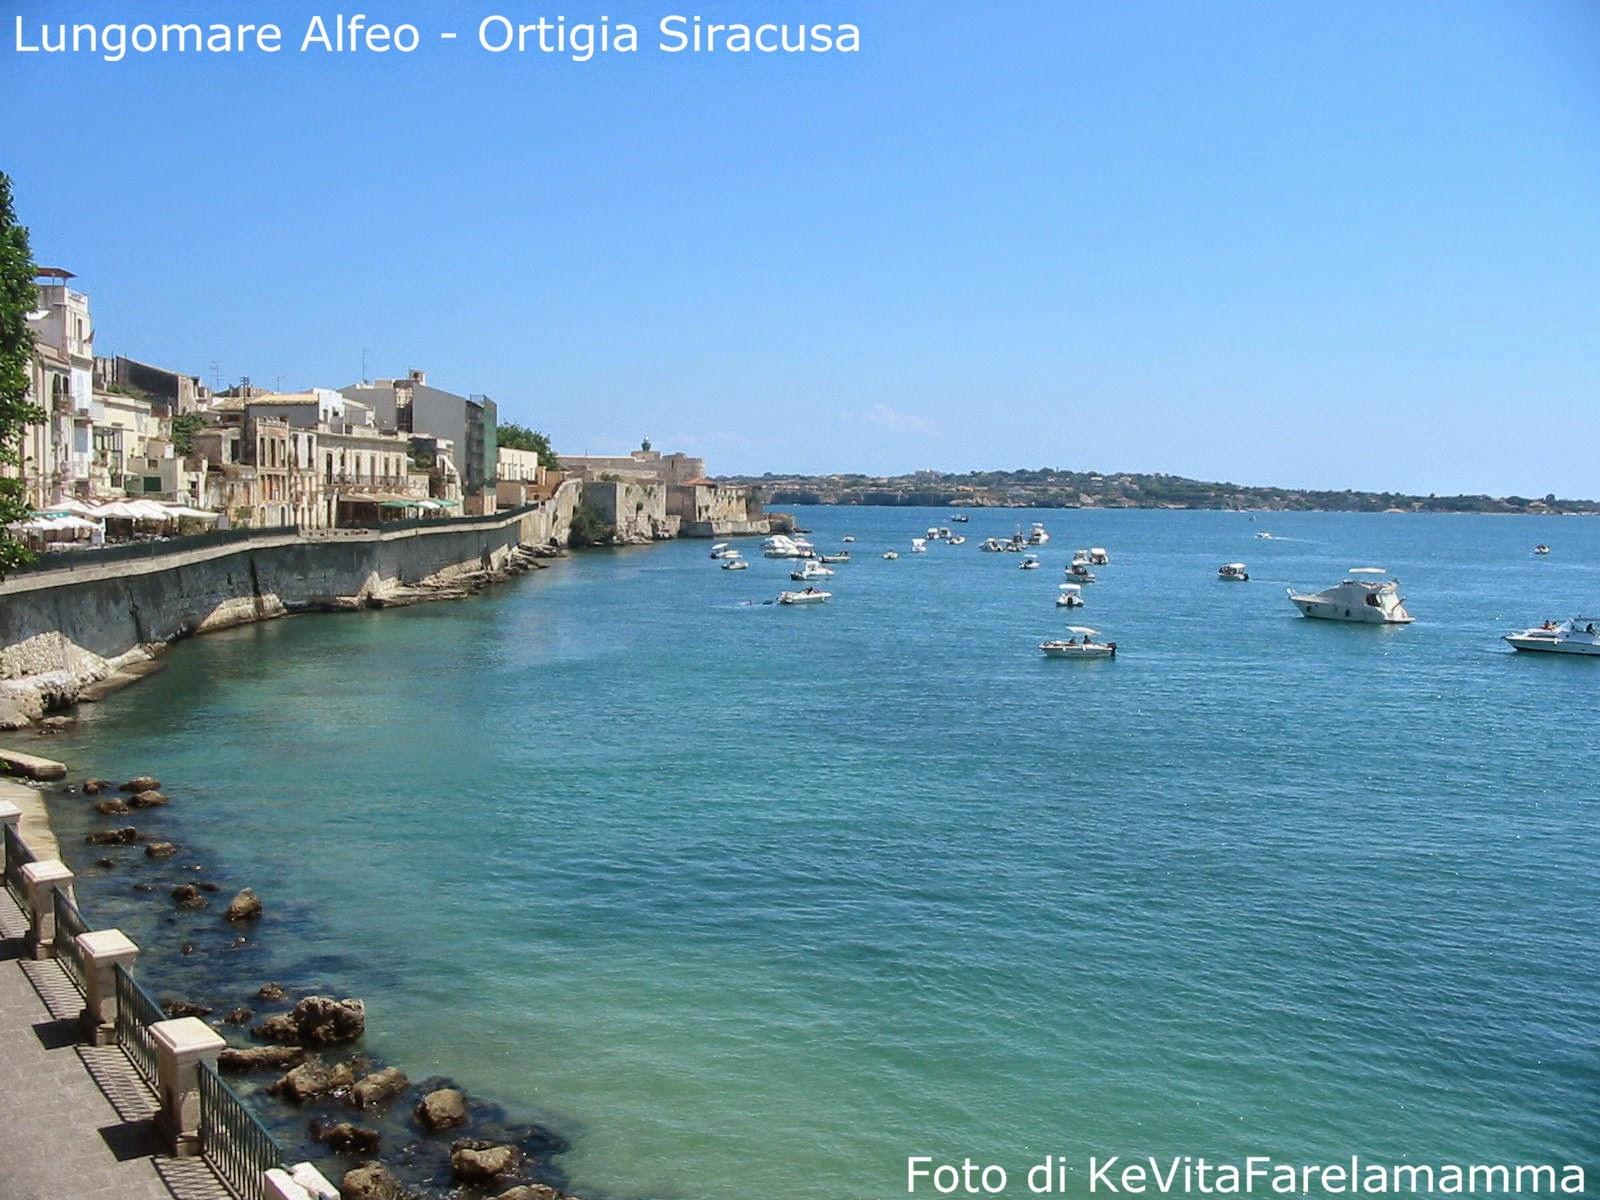 Le vacanze in quel di siracusa kevitafarelamamma for Siracusa vacanze mare